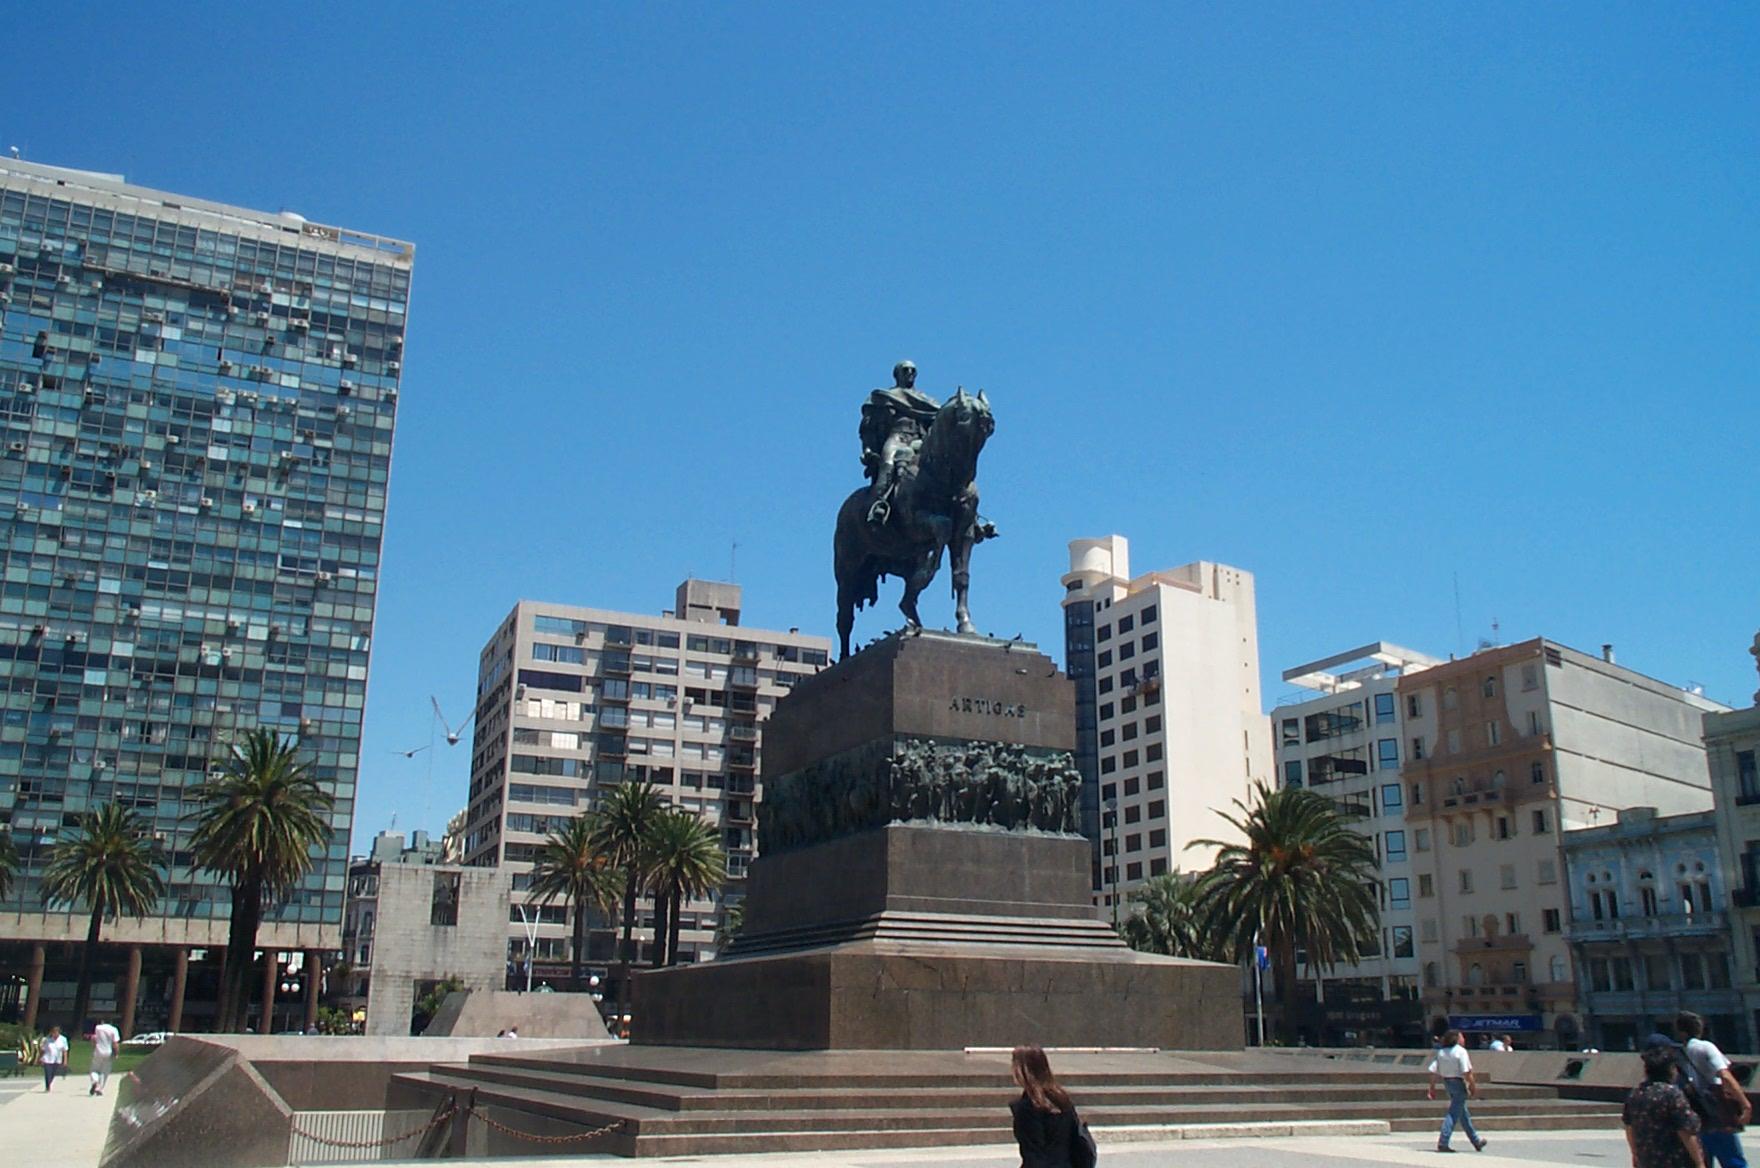 uruguay - photo #36